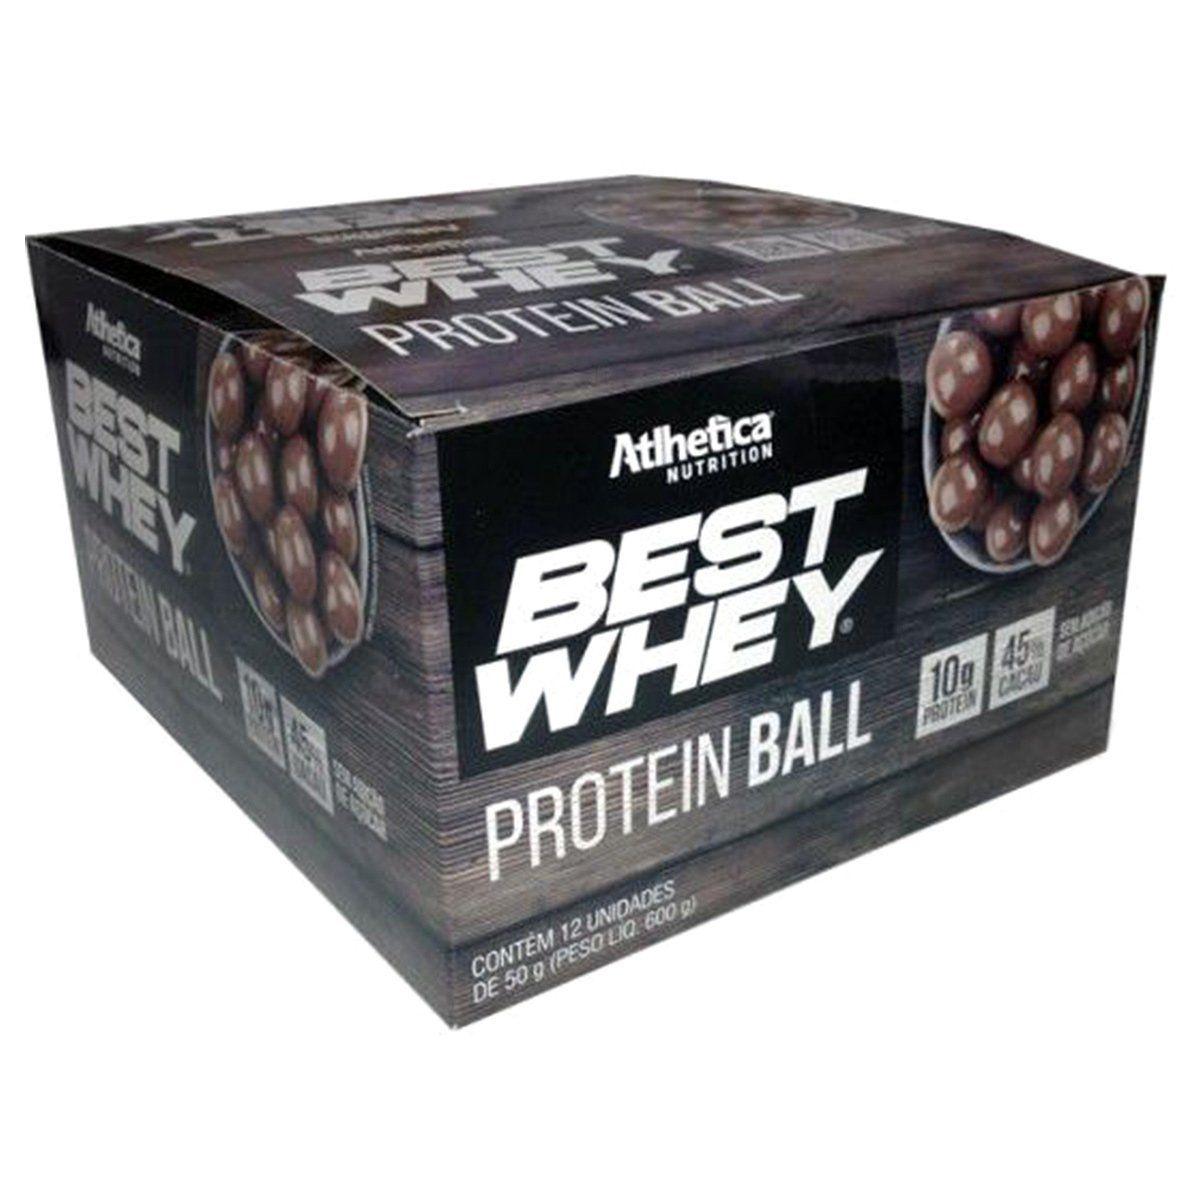 Caixa 12 unidades Best Whey Protein Ball Chocolate ao Leite (50g) - Atlhetica Nutrition